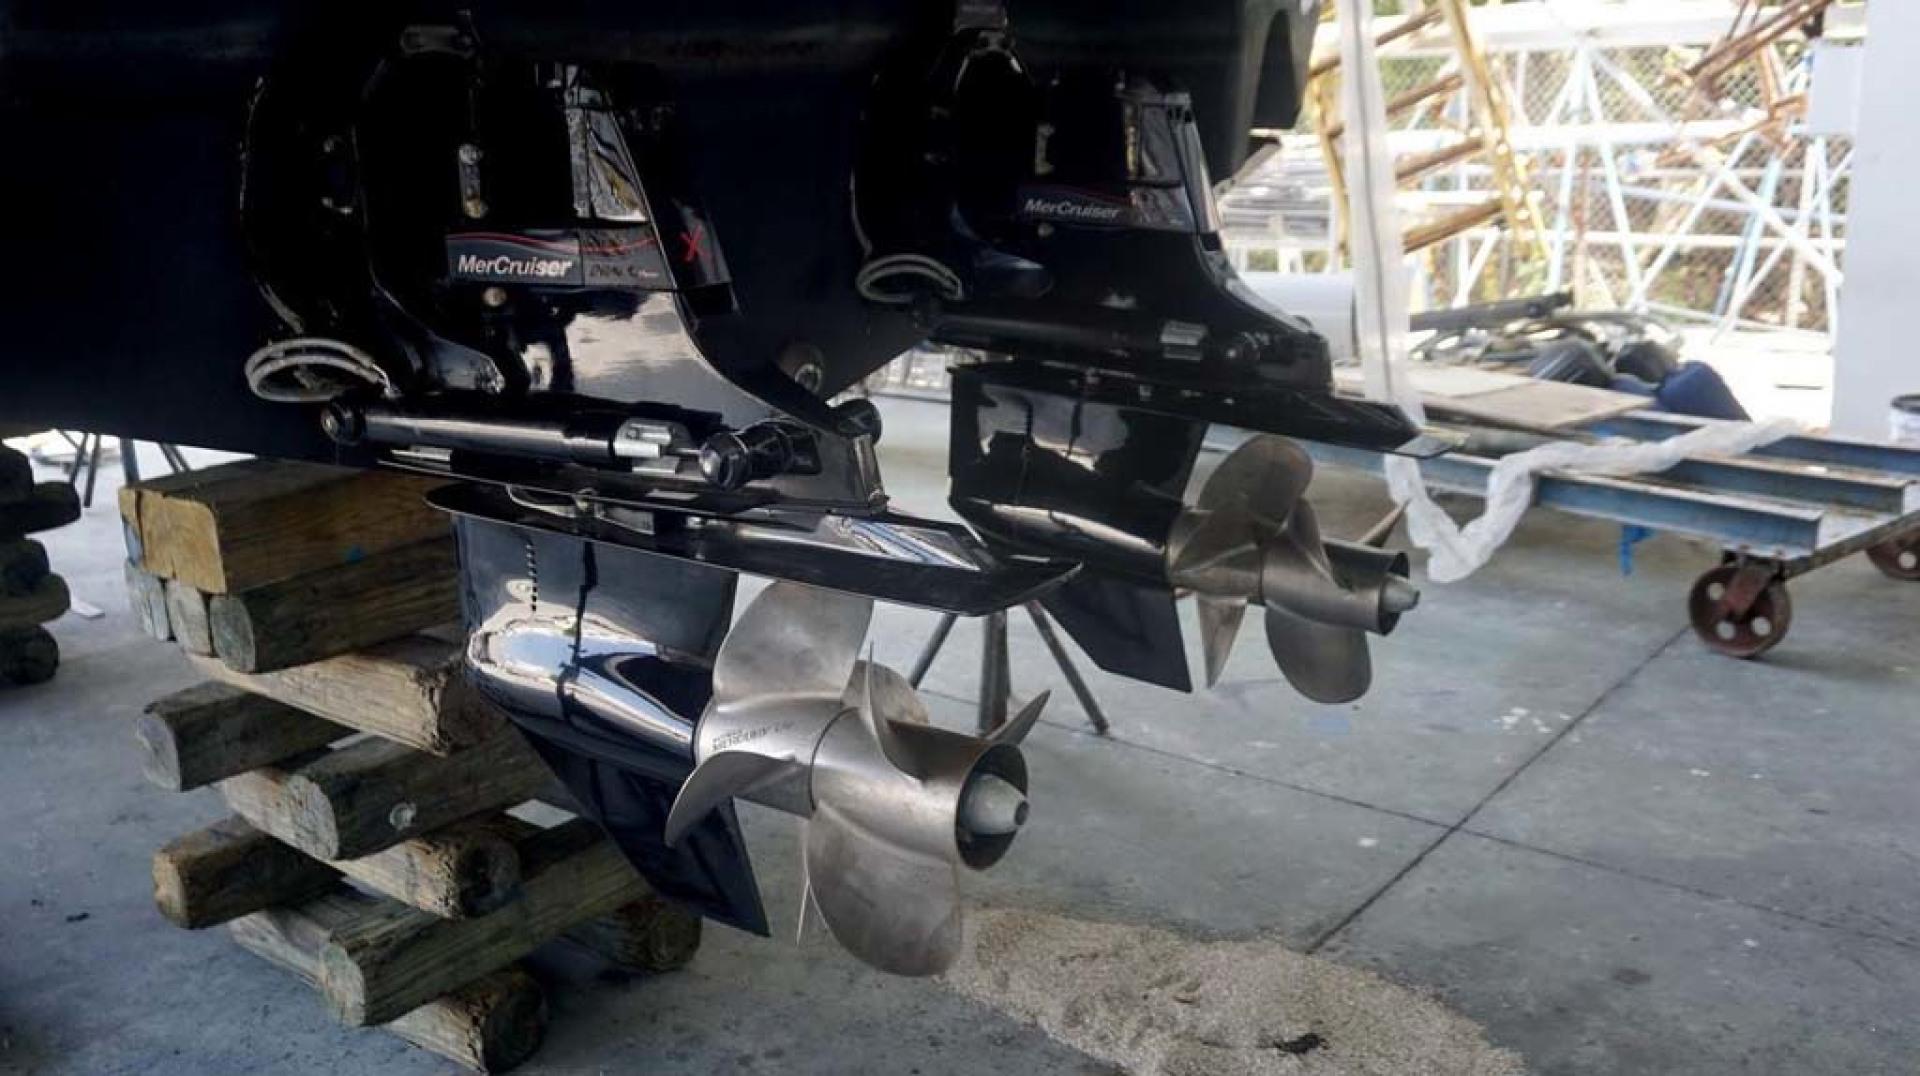 Chris-Craft-Corsair 36 2013-La Dolce Vita Fort Lauderdale-Florida-United States-Drives-1074580 | Thumbnail